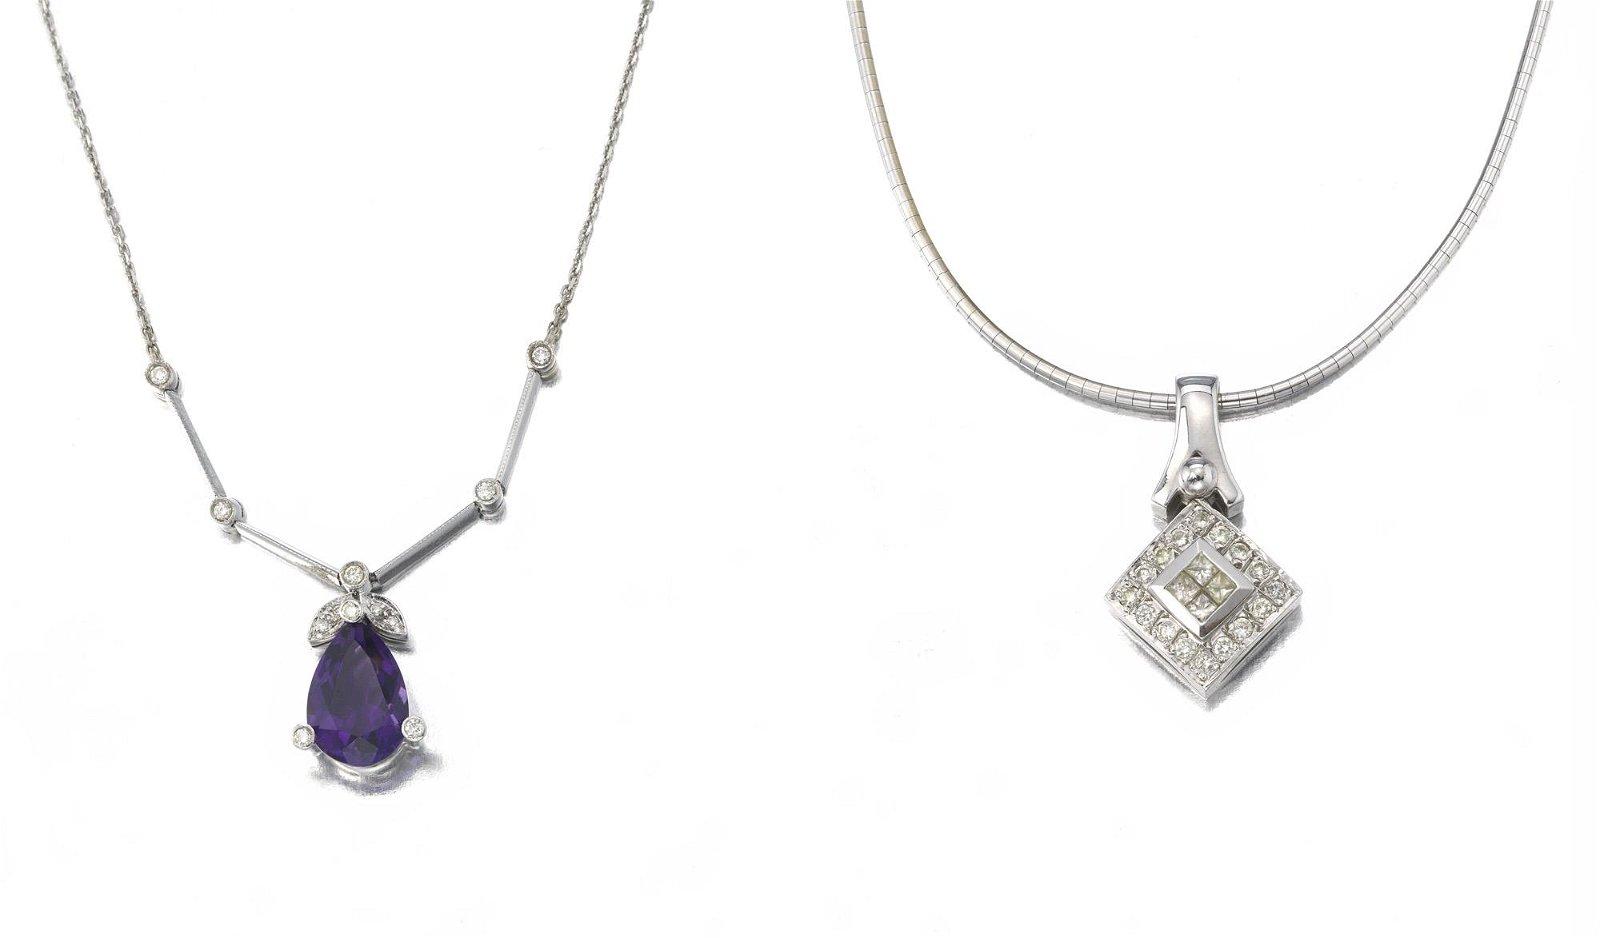 Two pendant necklaces